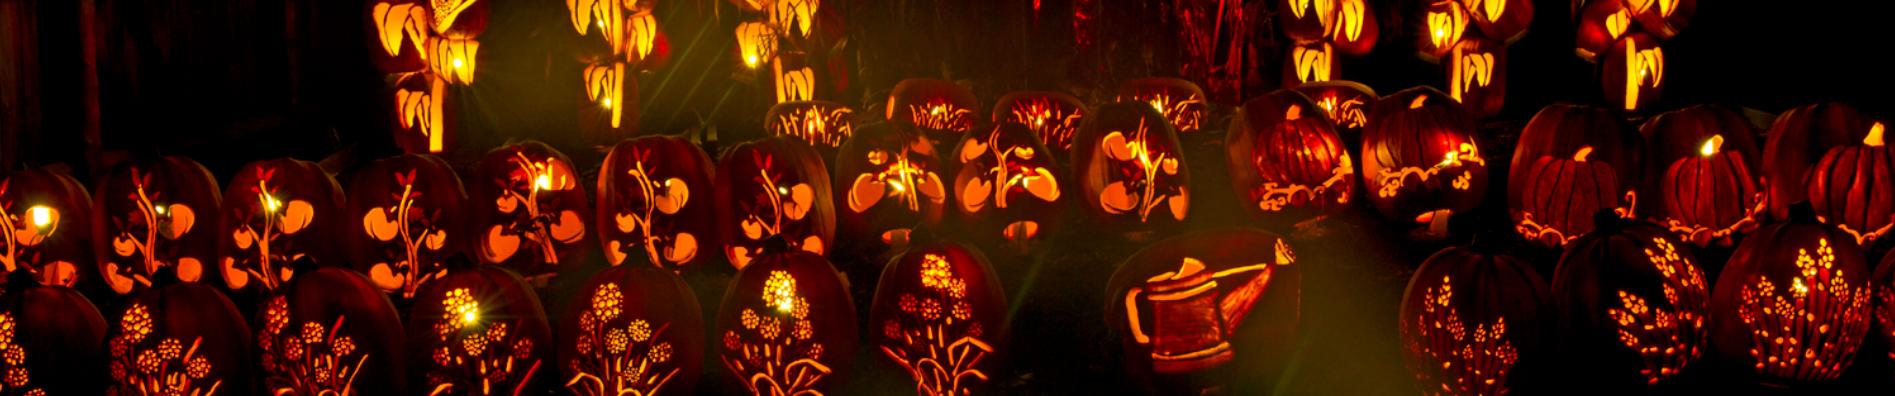 Pumpkinferno Starts, Upper Canada Village @ Upper Canada Village | Morrisburg | Ontario | Canada